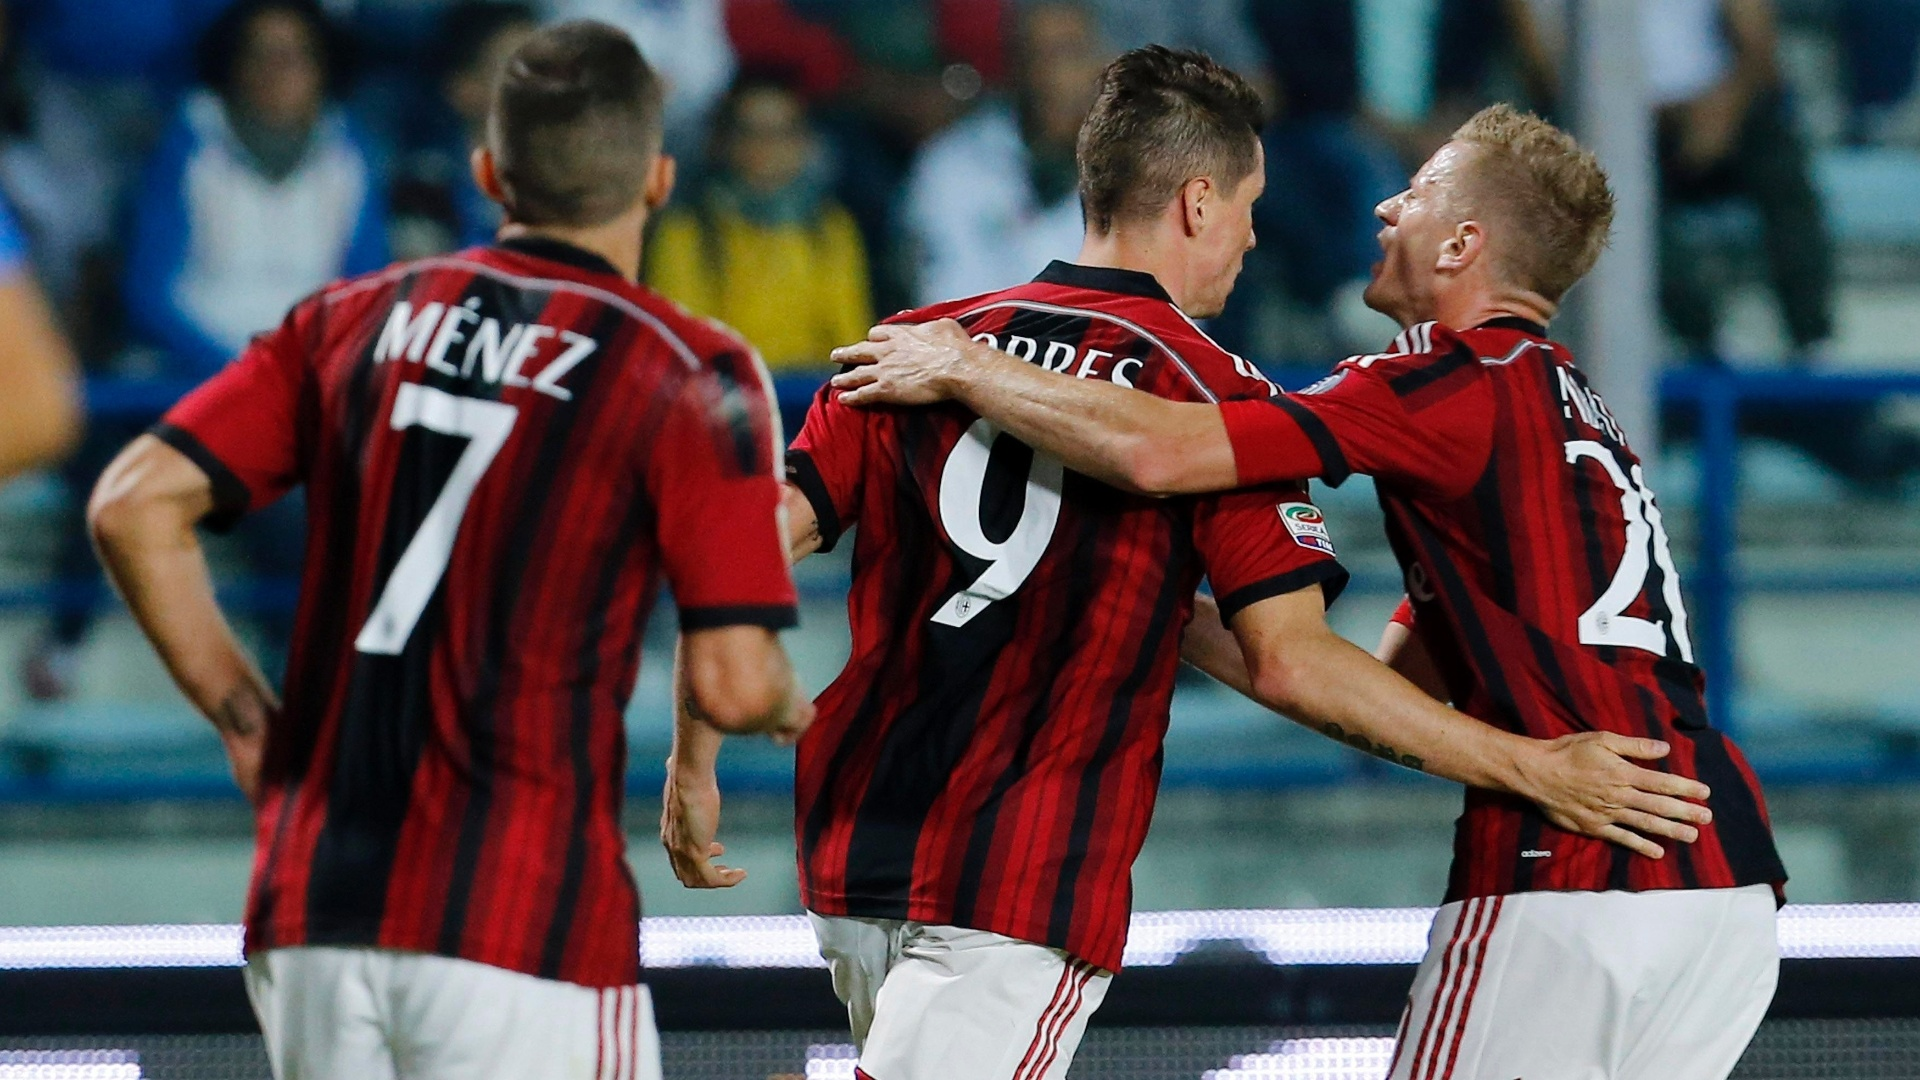 23. set. 2014 - Fernando Torres comemora gol do Milan contra o Empoli, pelo Campeonato Italiano